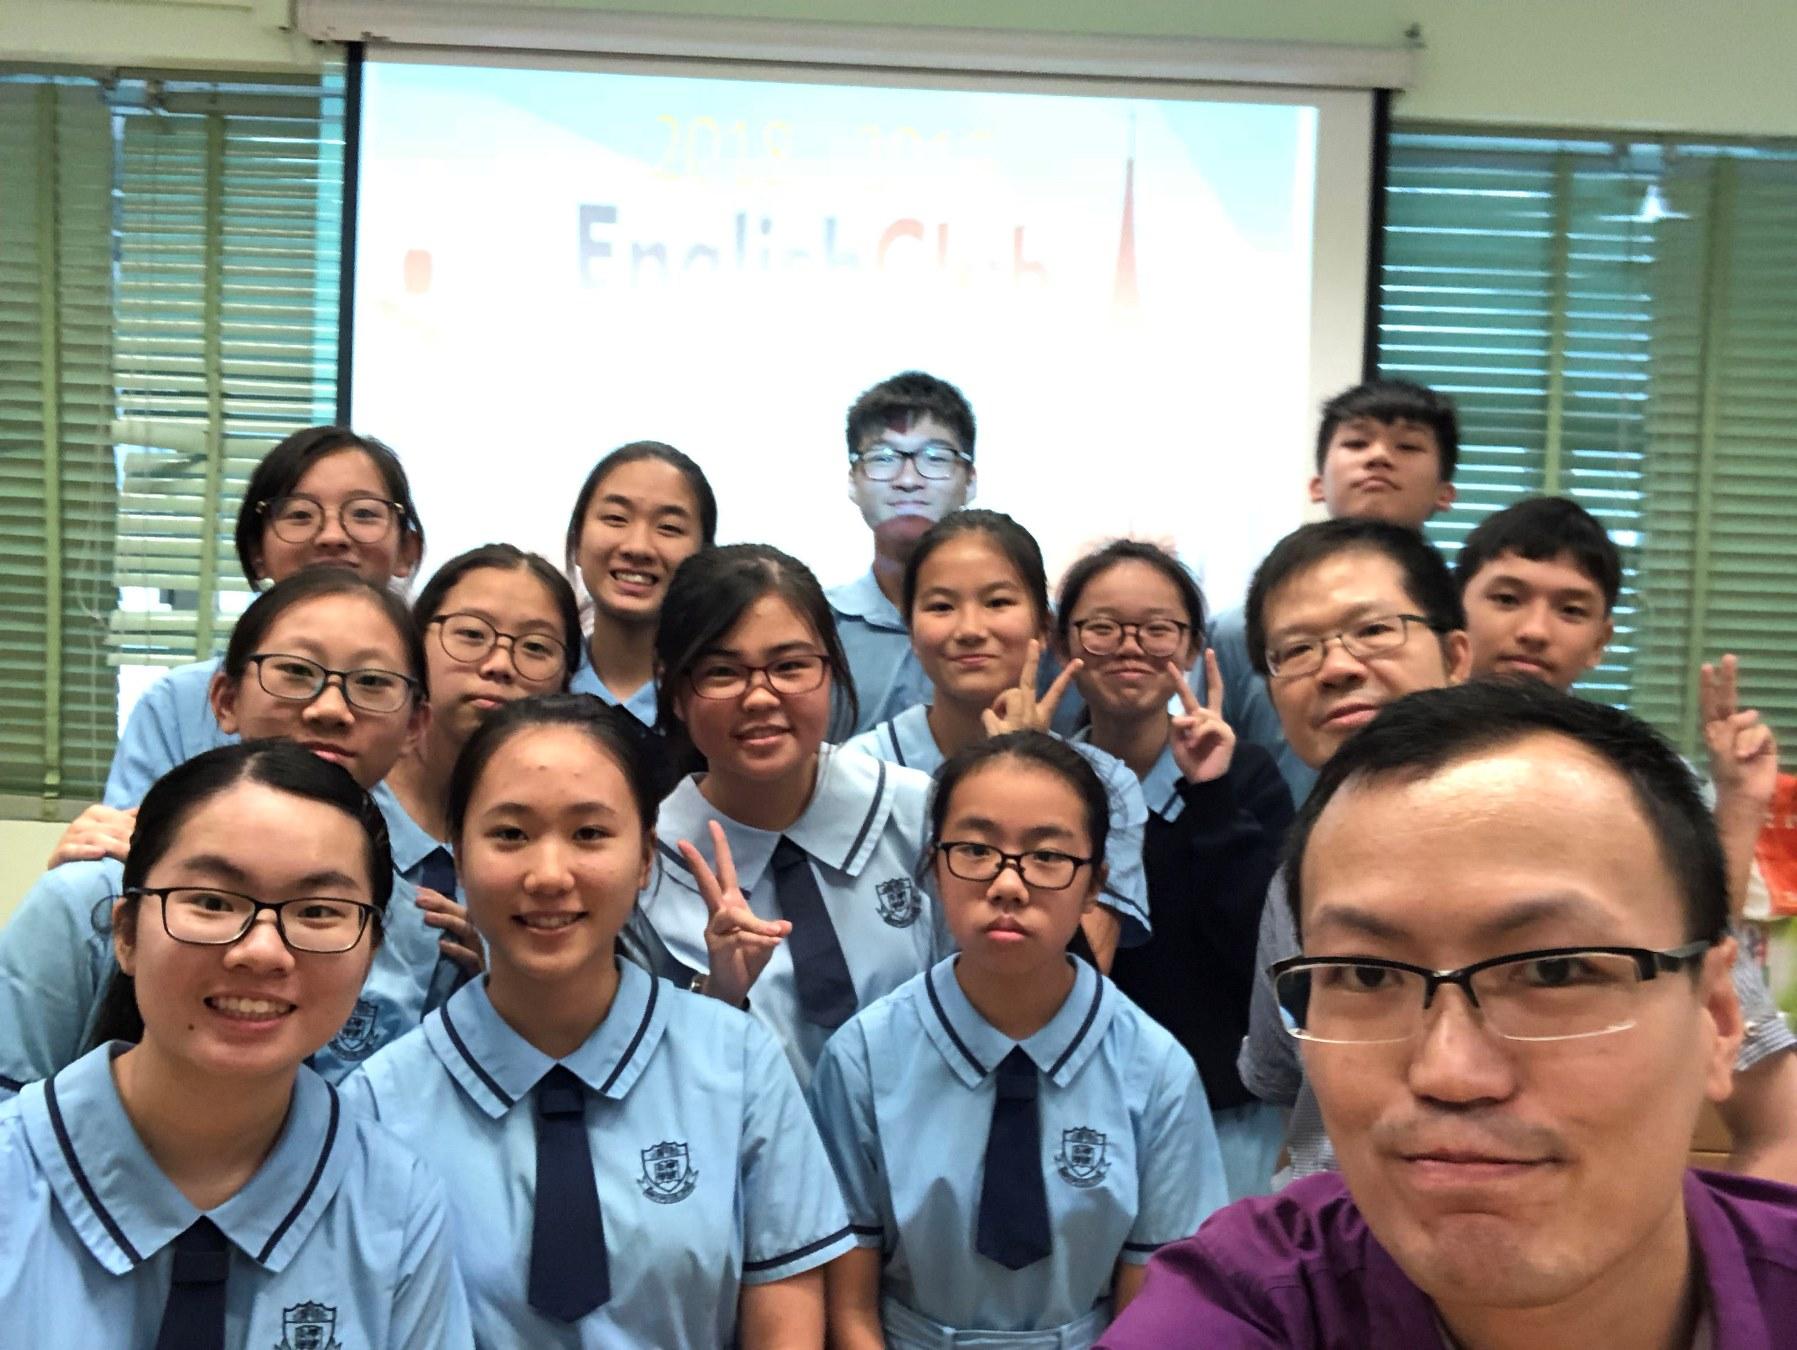 http://www.npc.edu.hk/sites/default/files/img_9617.jpg